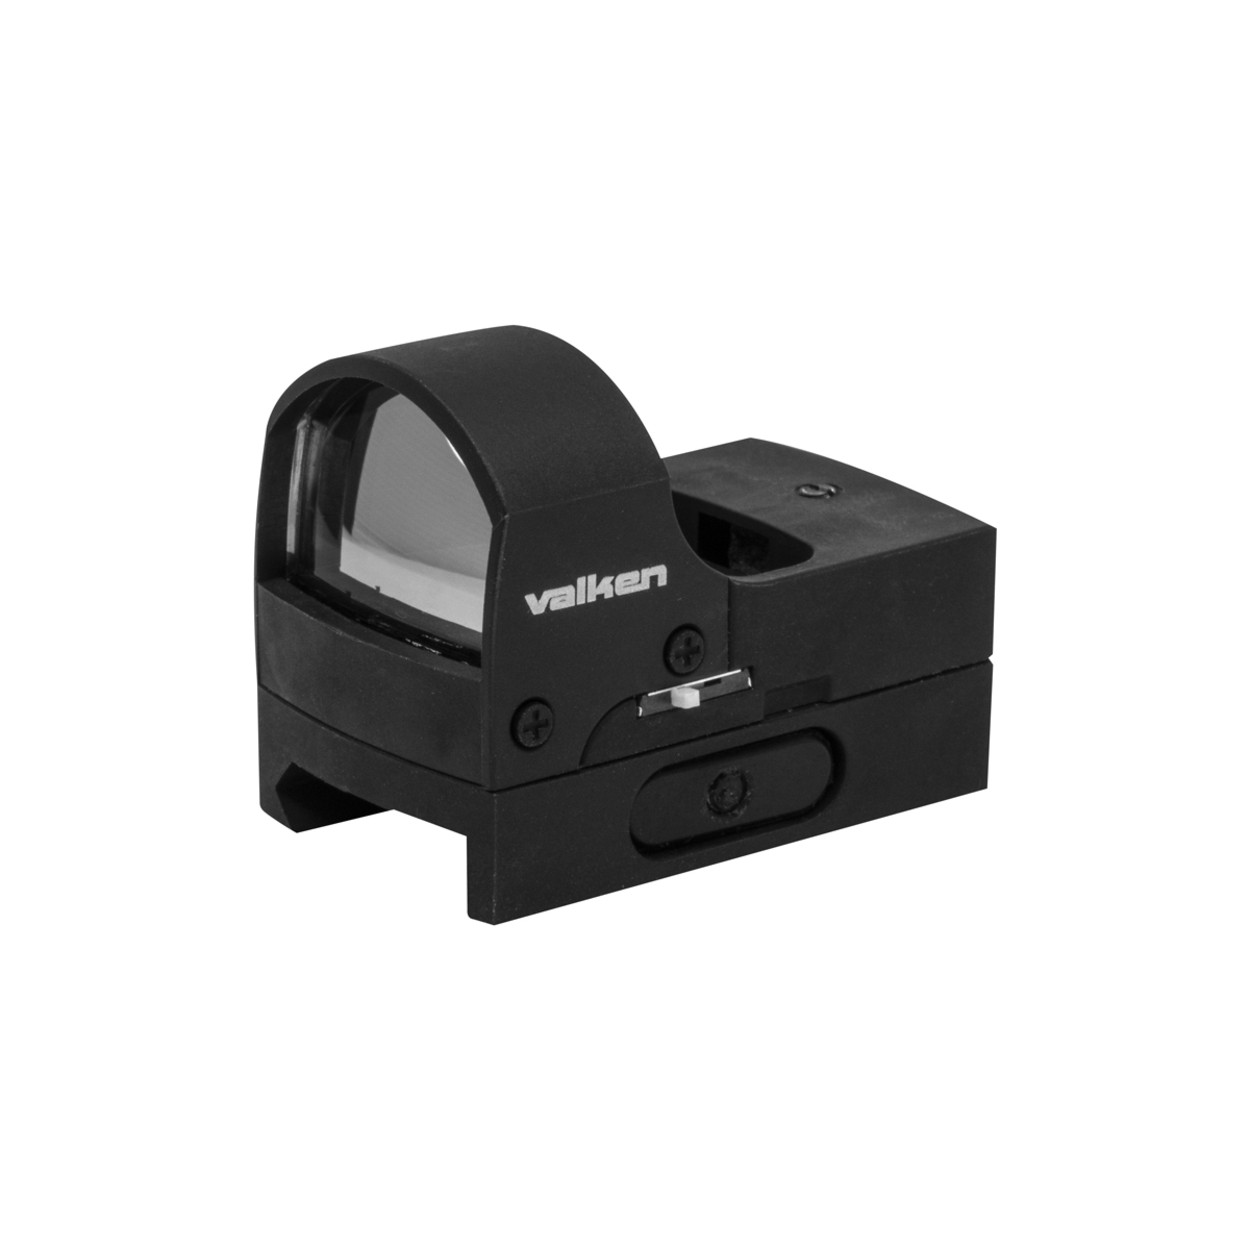 Valken Mini Reflex Red Dot Sight Molded product image